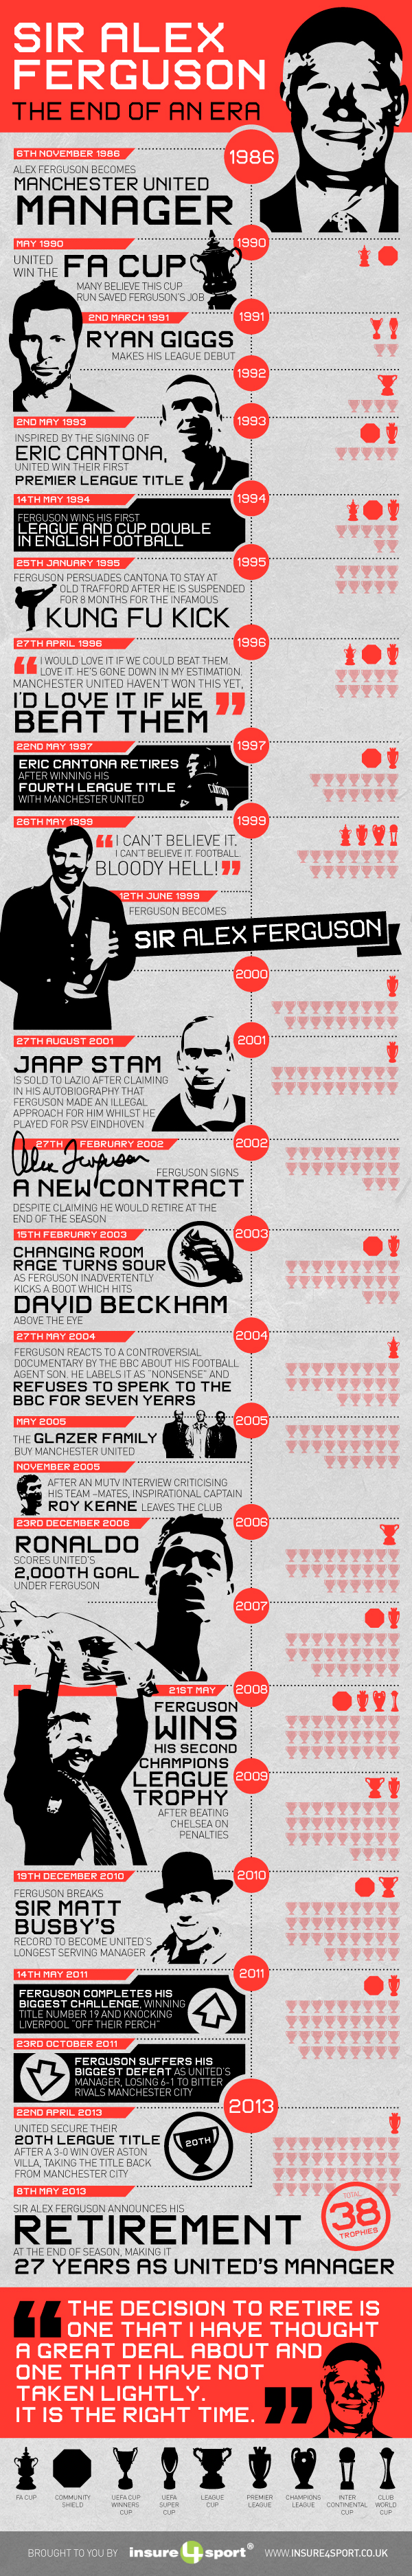 Alex Ferguson Infographic insure4sport